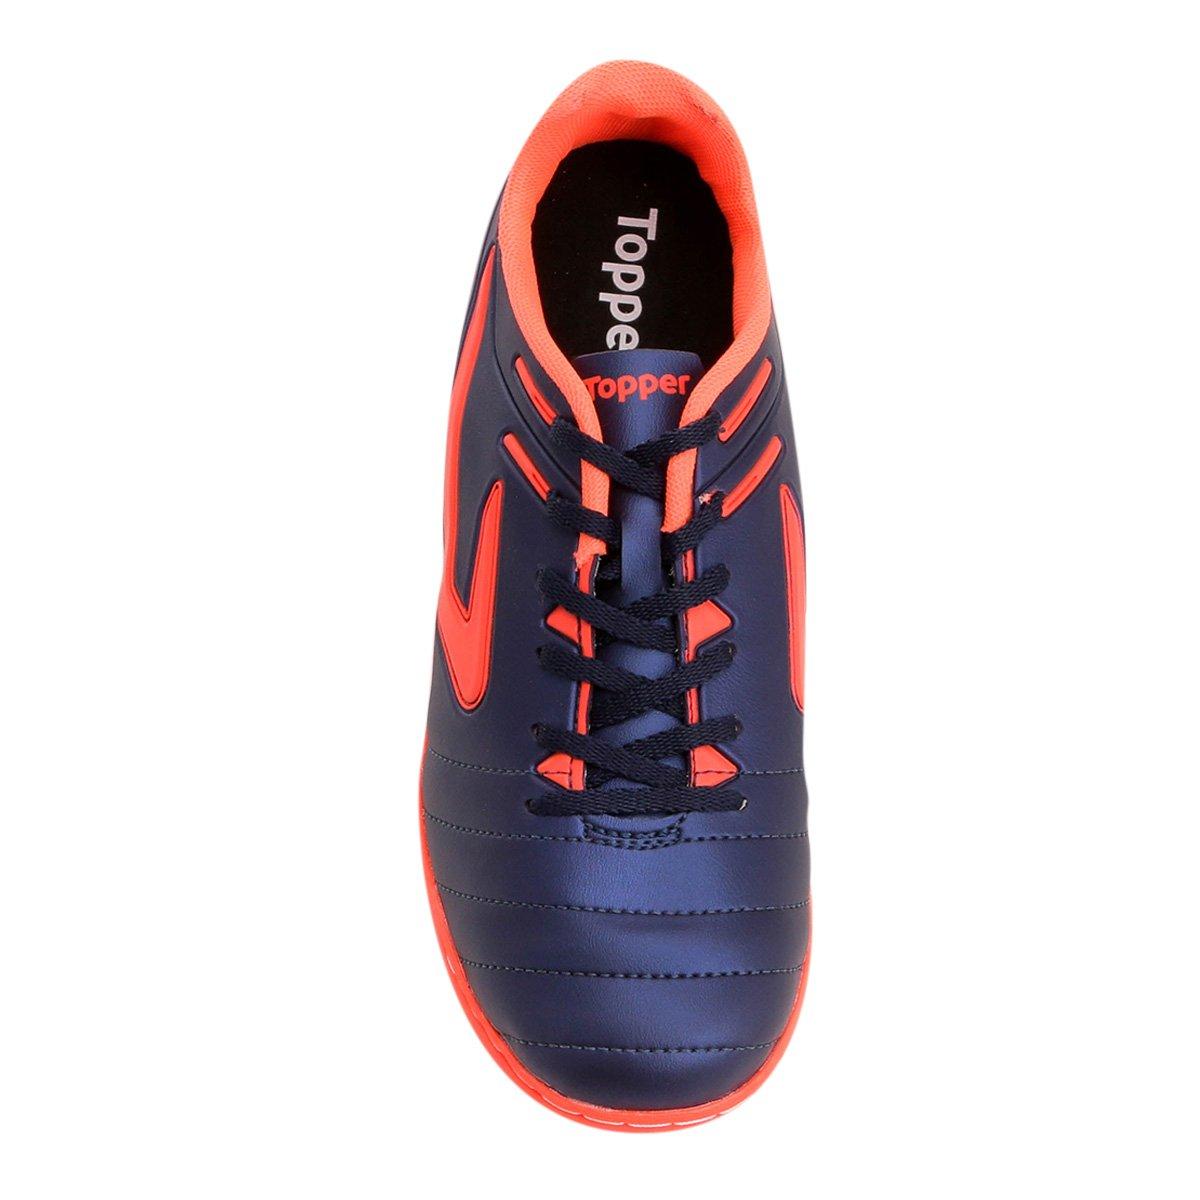 Chuteira Futsal Topper Boleiro - Marinho e Cinza - Compre Agora ... e8207c8773f5a